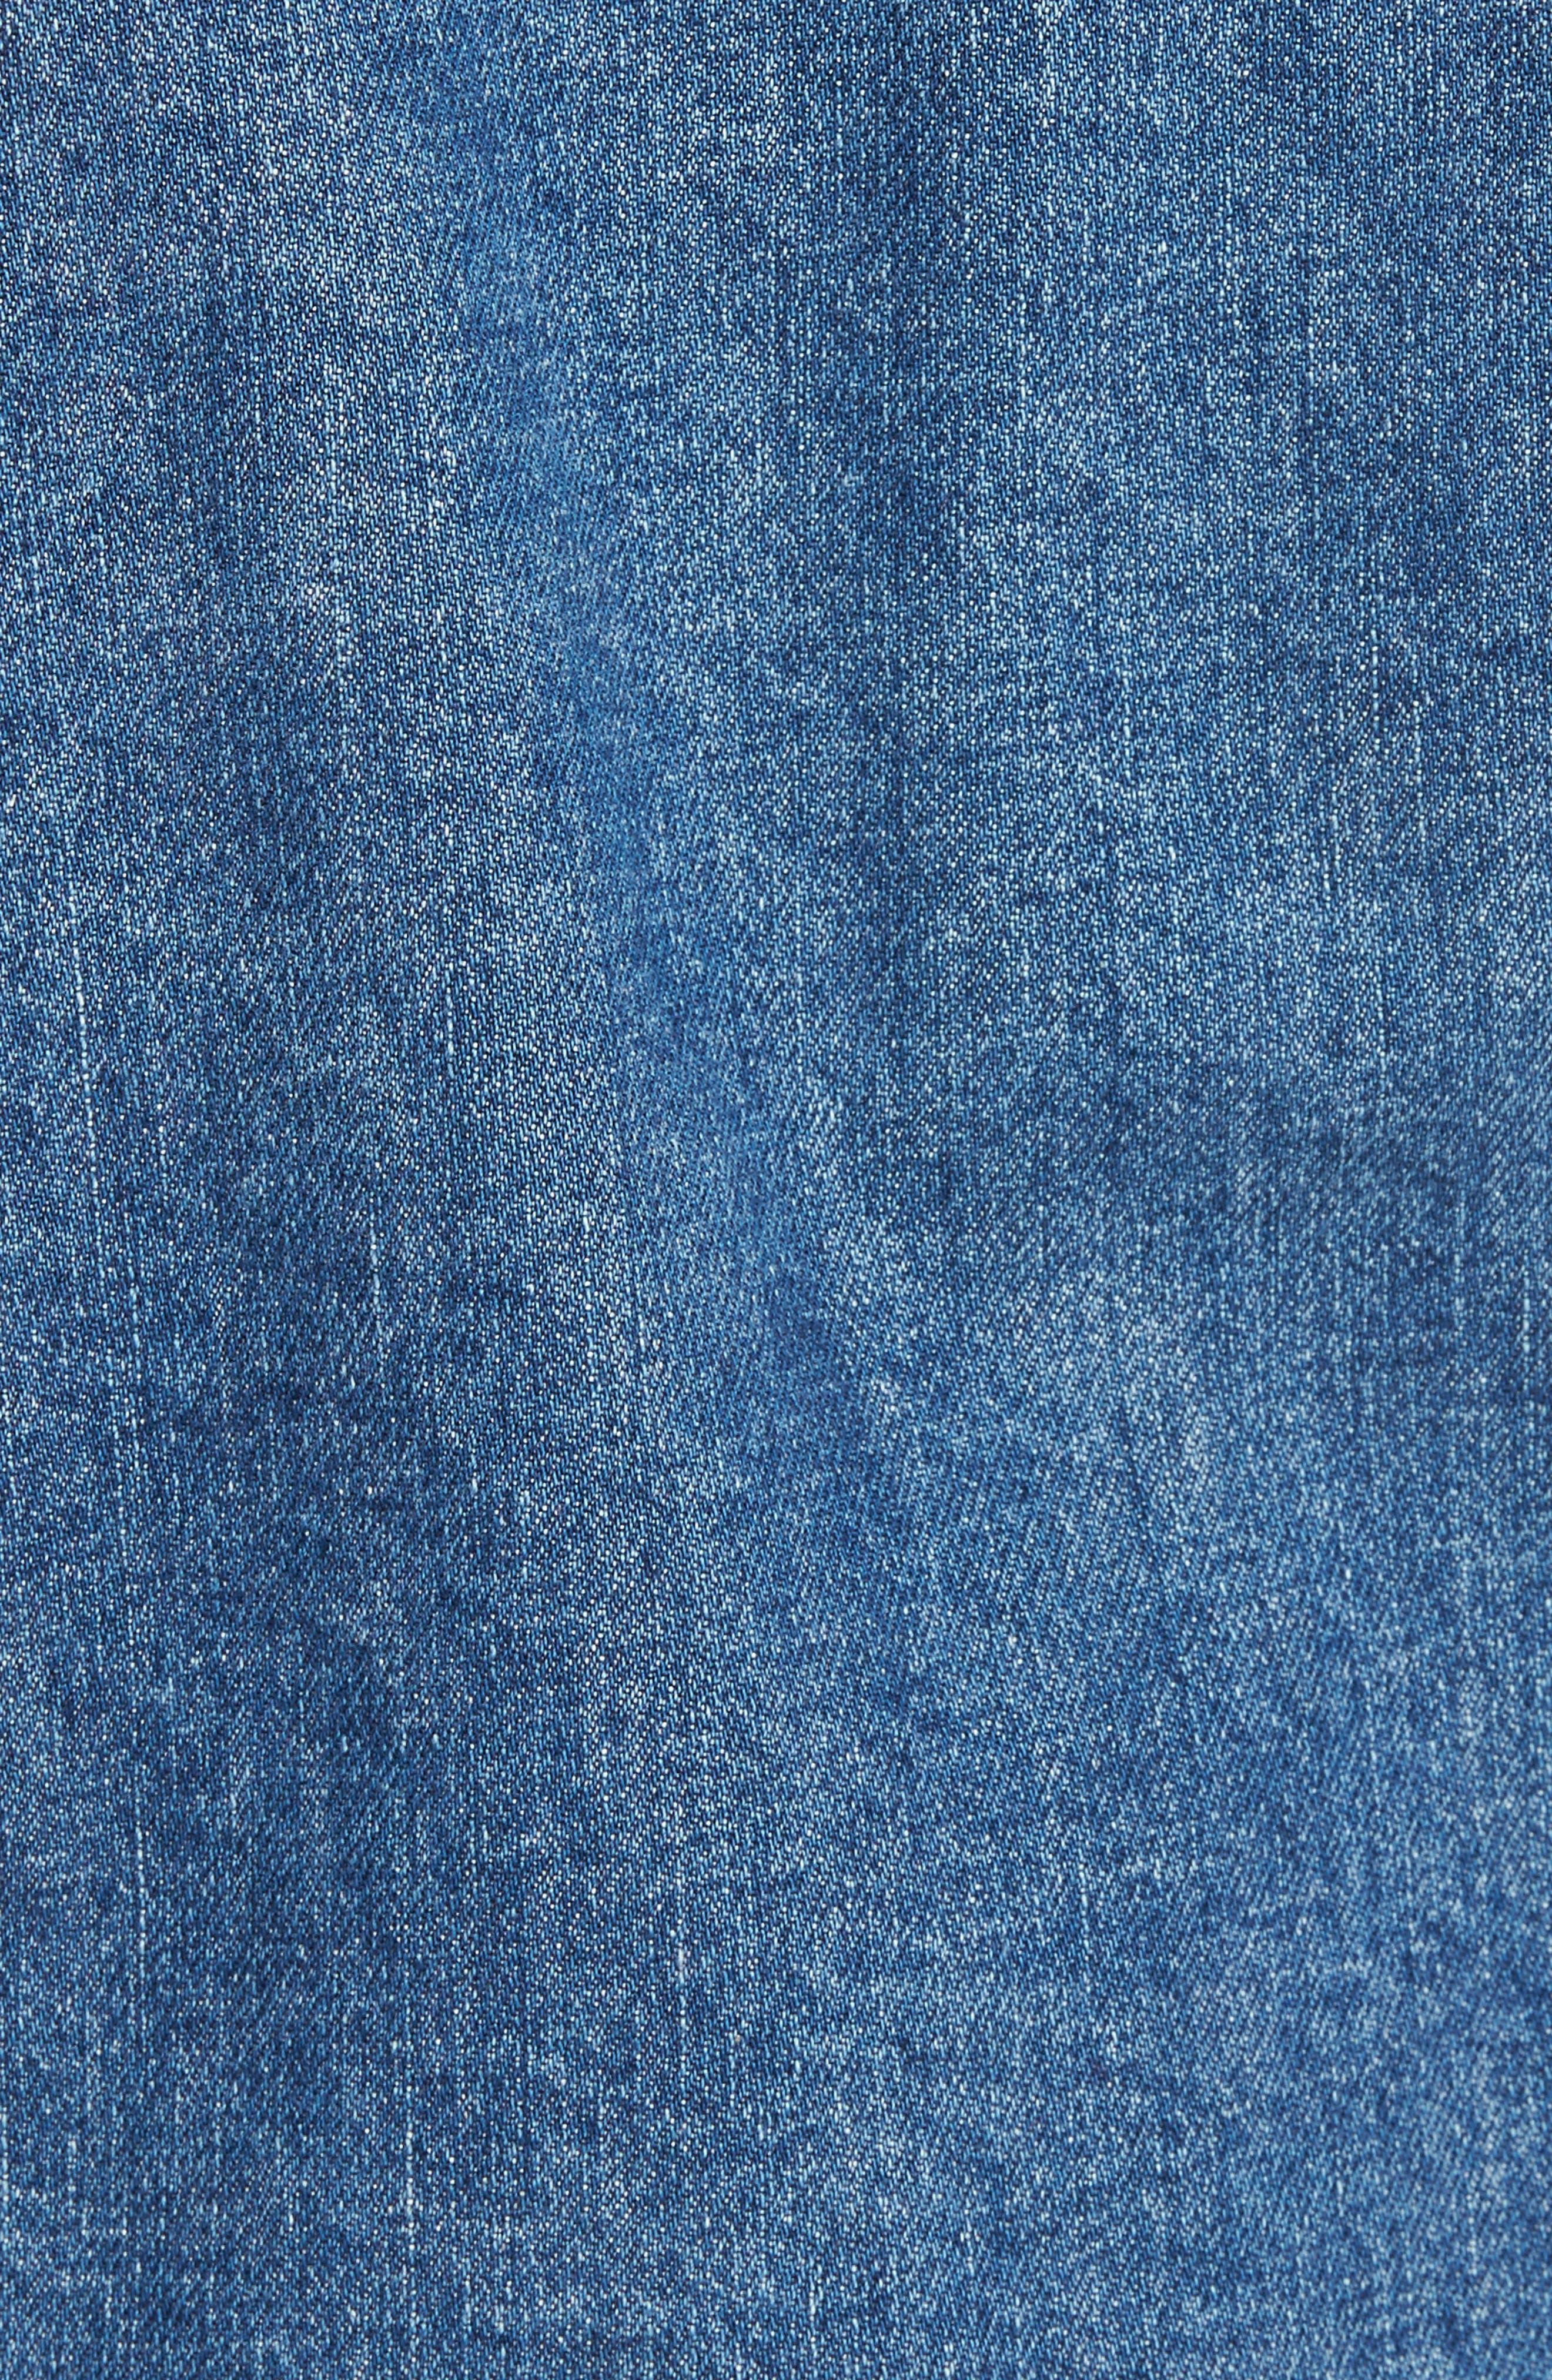 Garrison Crop Denim Jacket,                             Alternate thumbnail 6, color,                             450